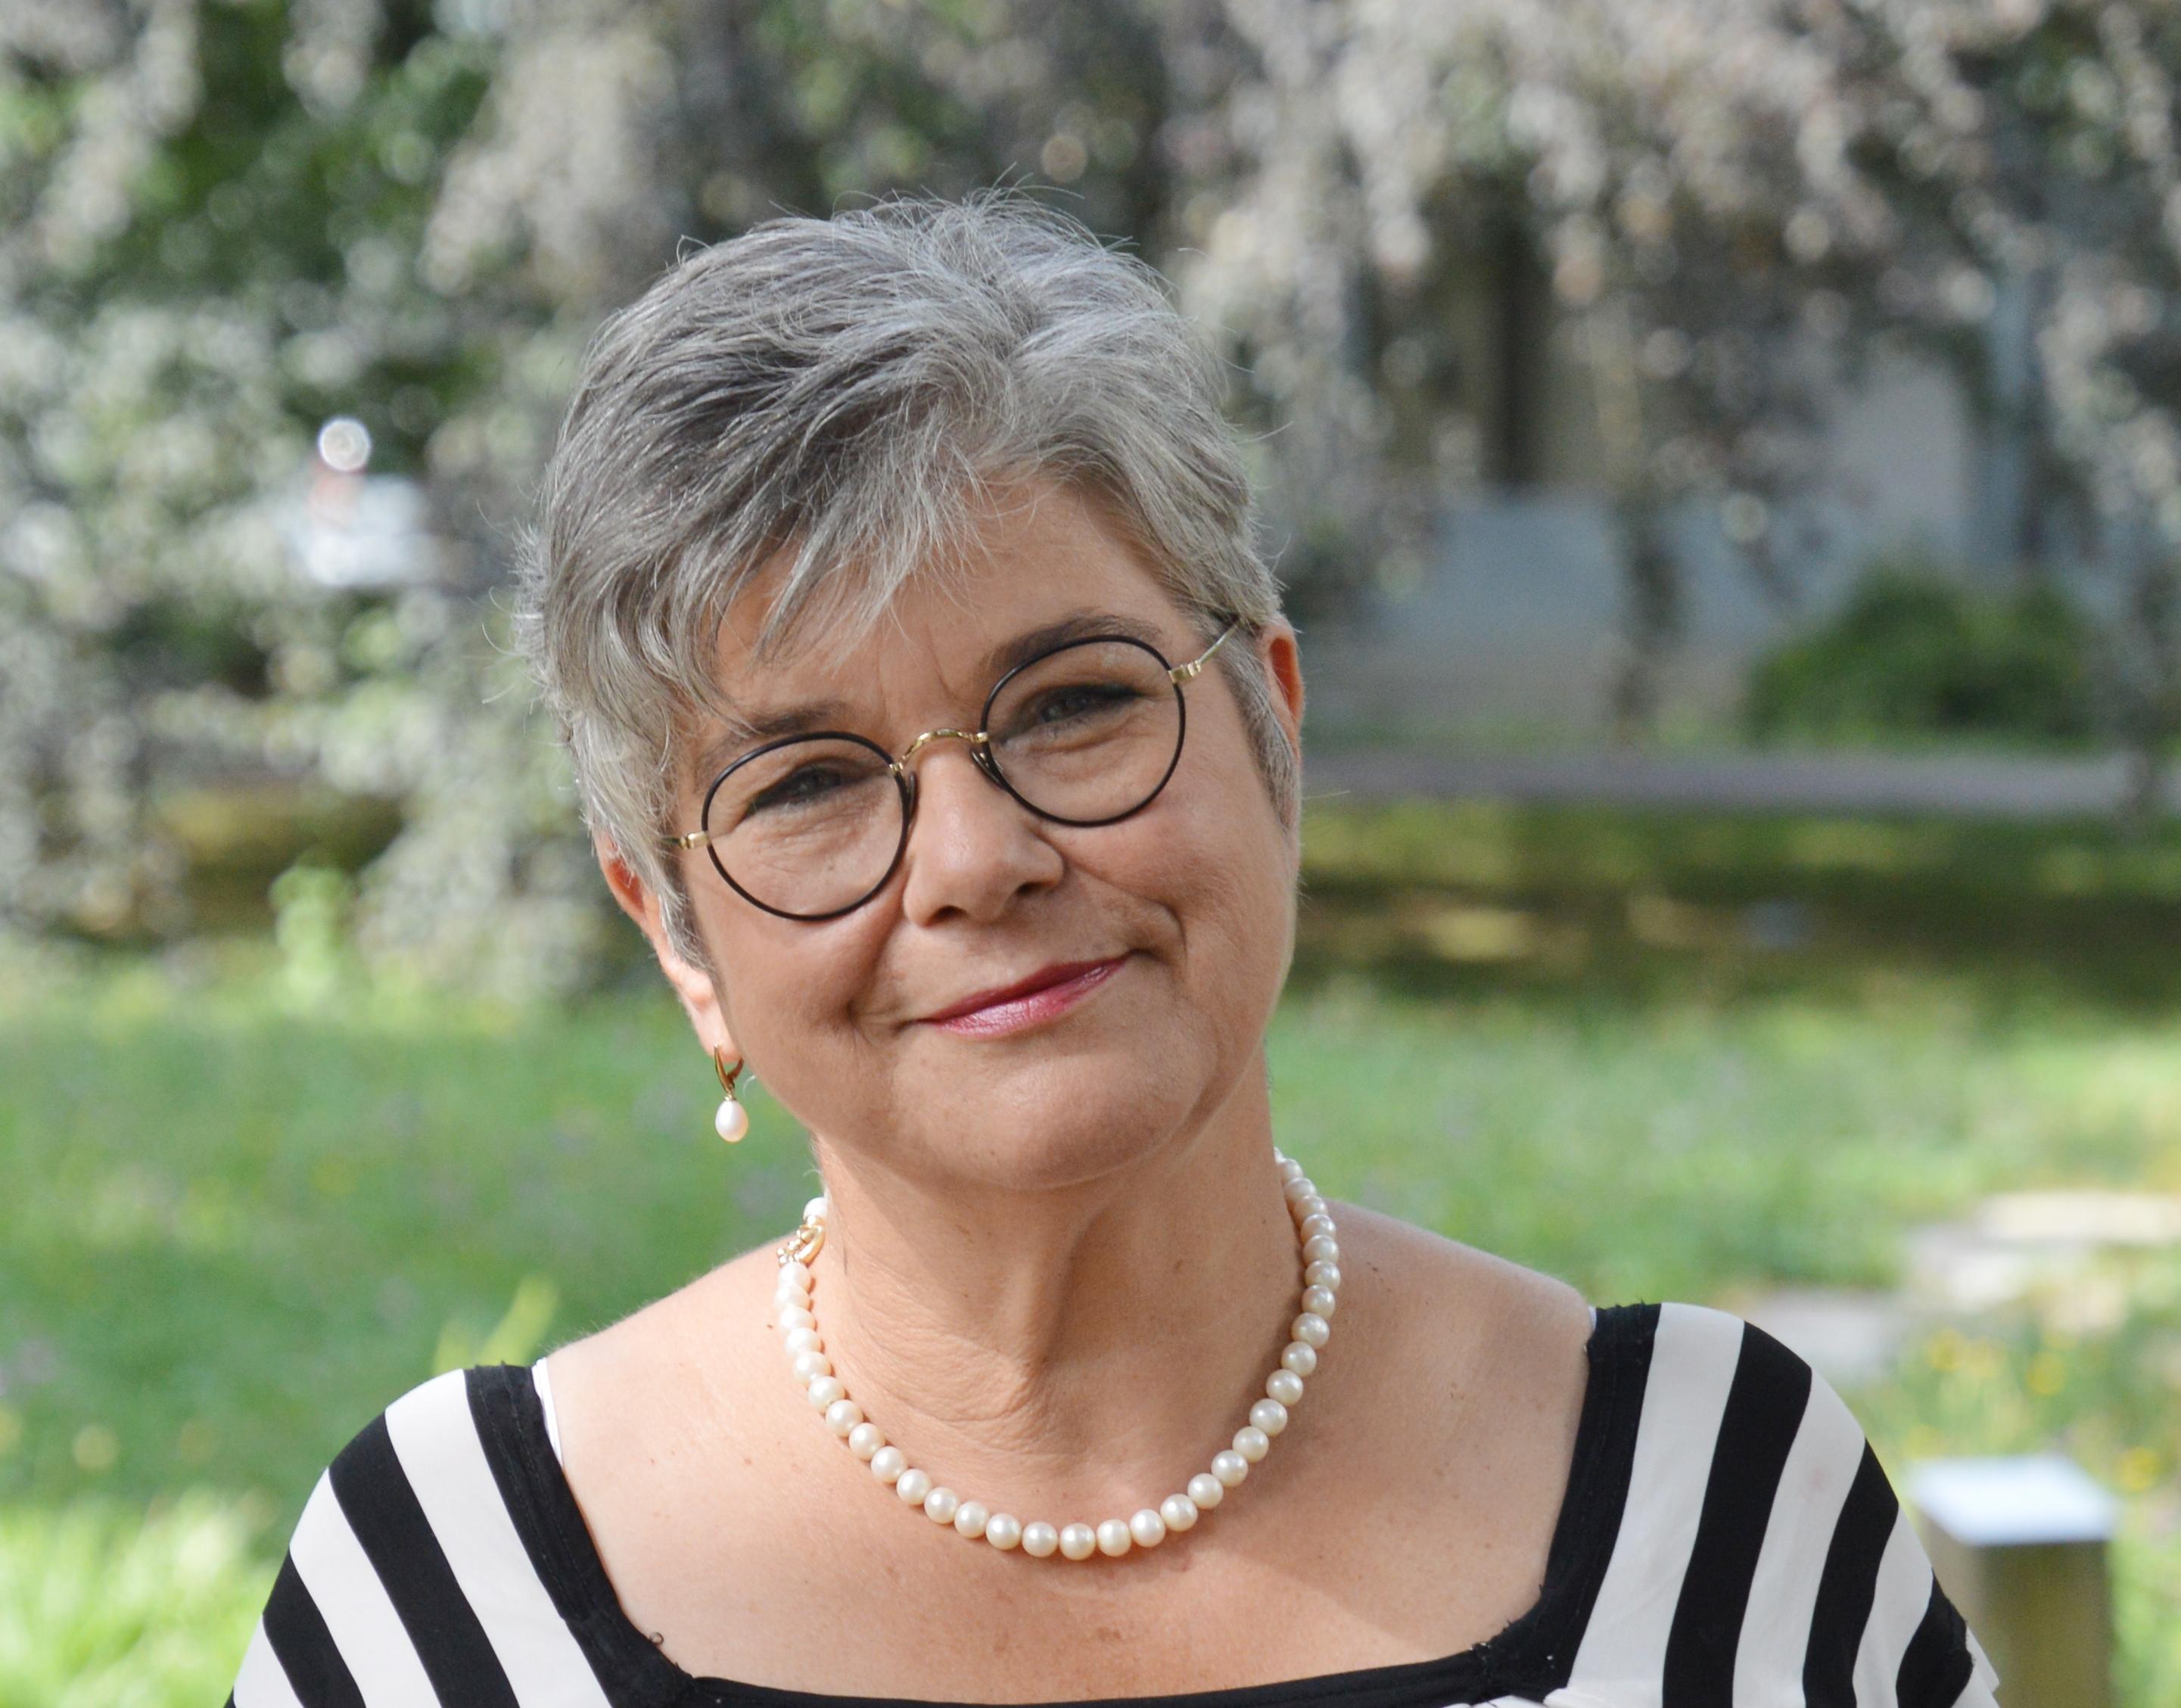 Dr. Susanne Schoppmann